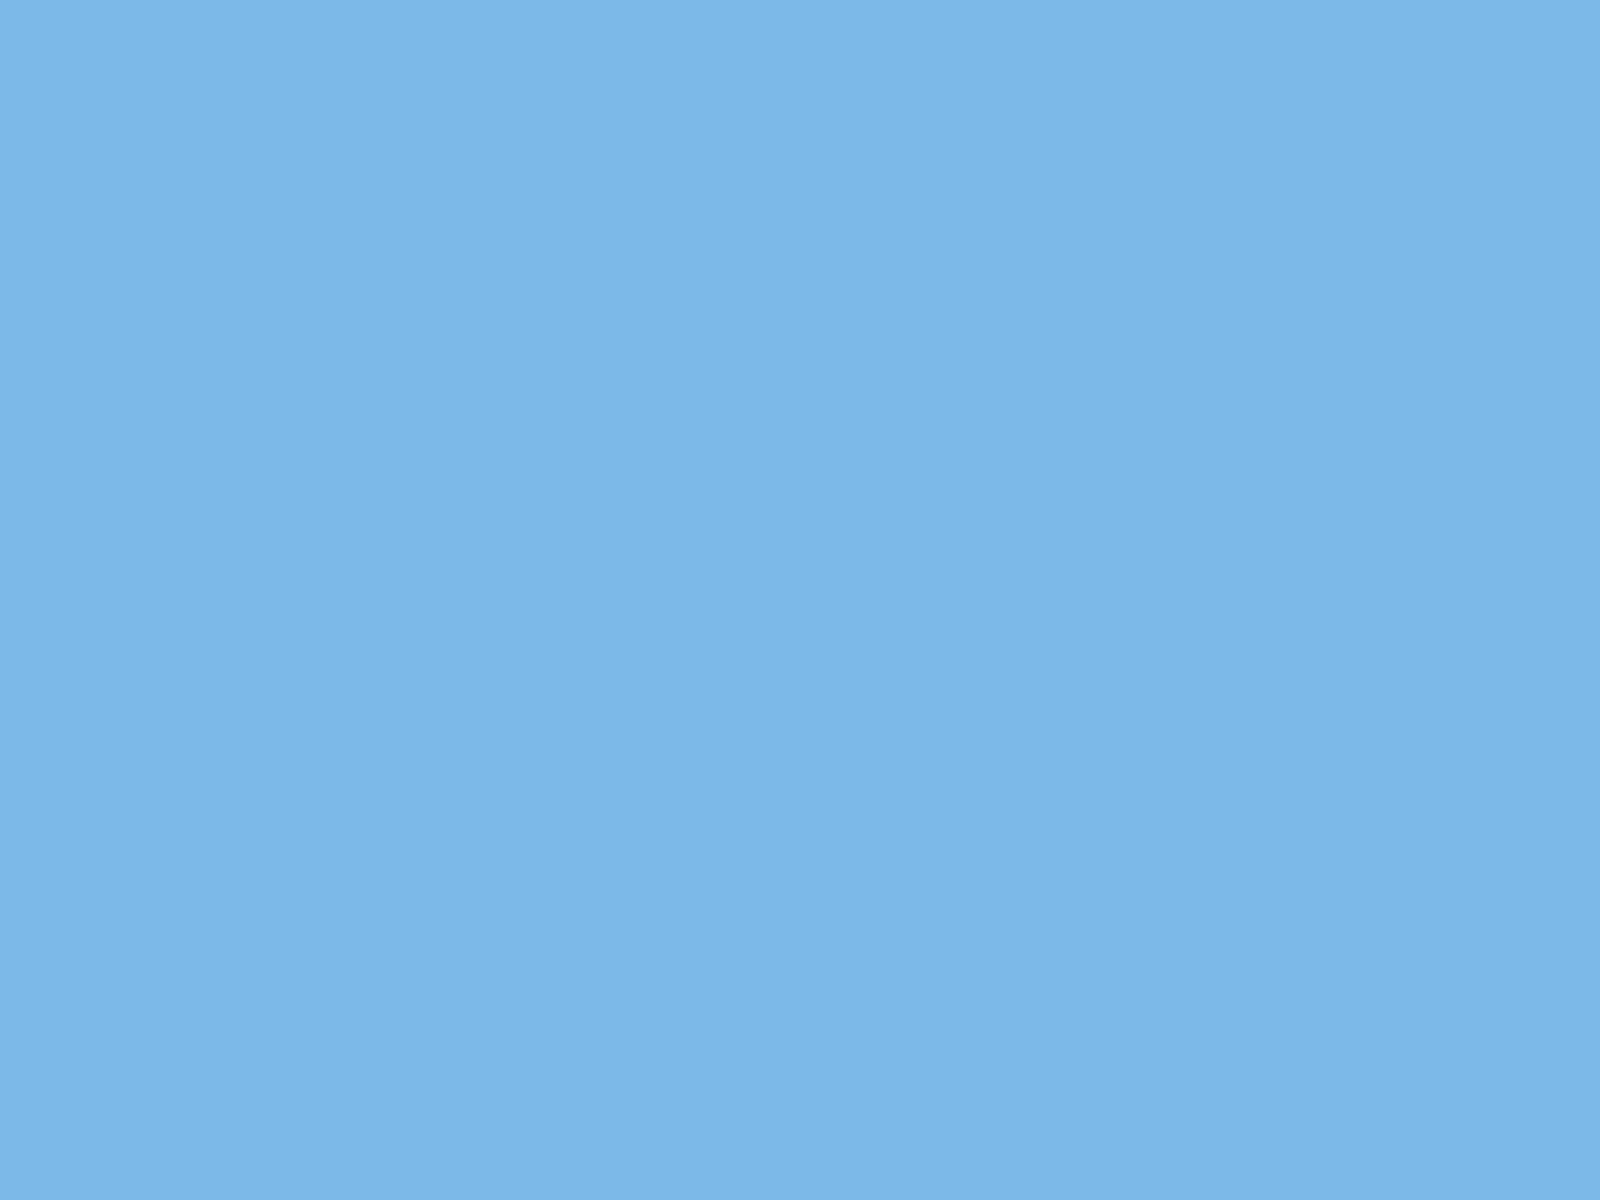 1600x1200 Aero Solid Color Background